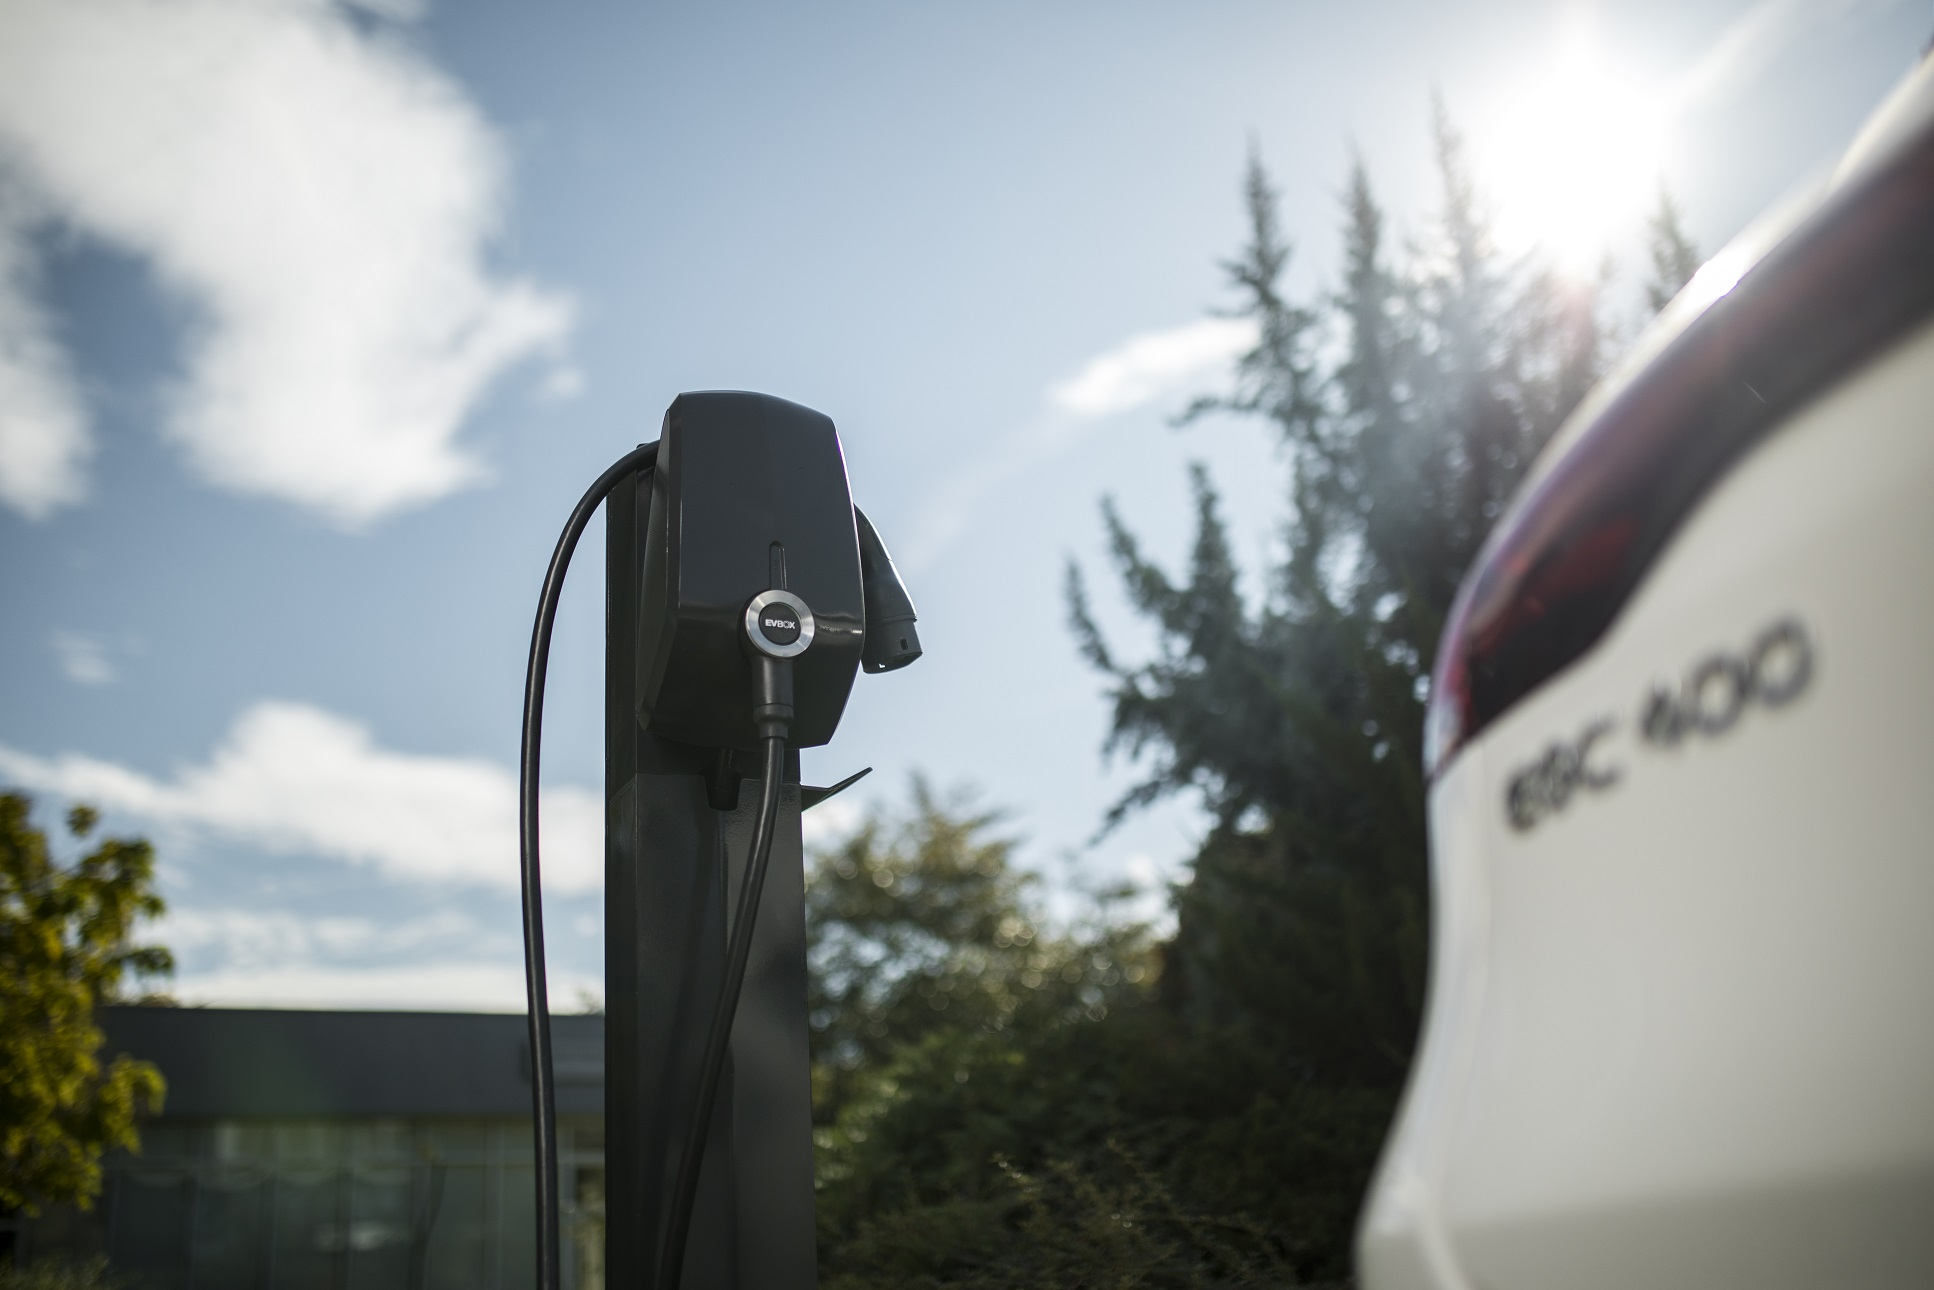 Mercedes-Benz oferă o stație de încărcare gratuis la fiecare Mercedes-Benz EQC achiziționat